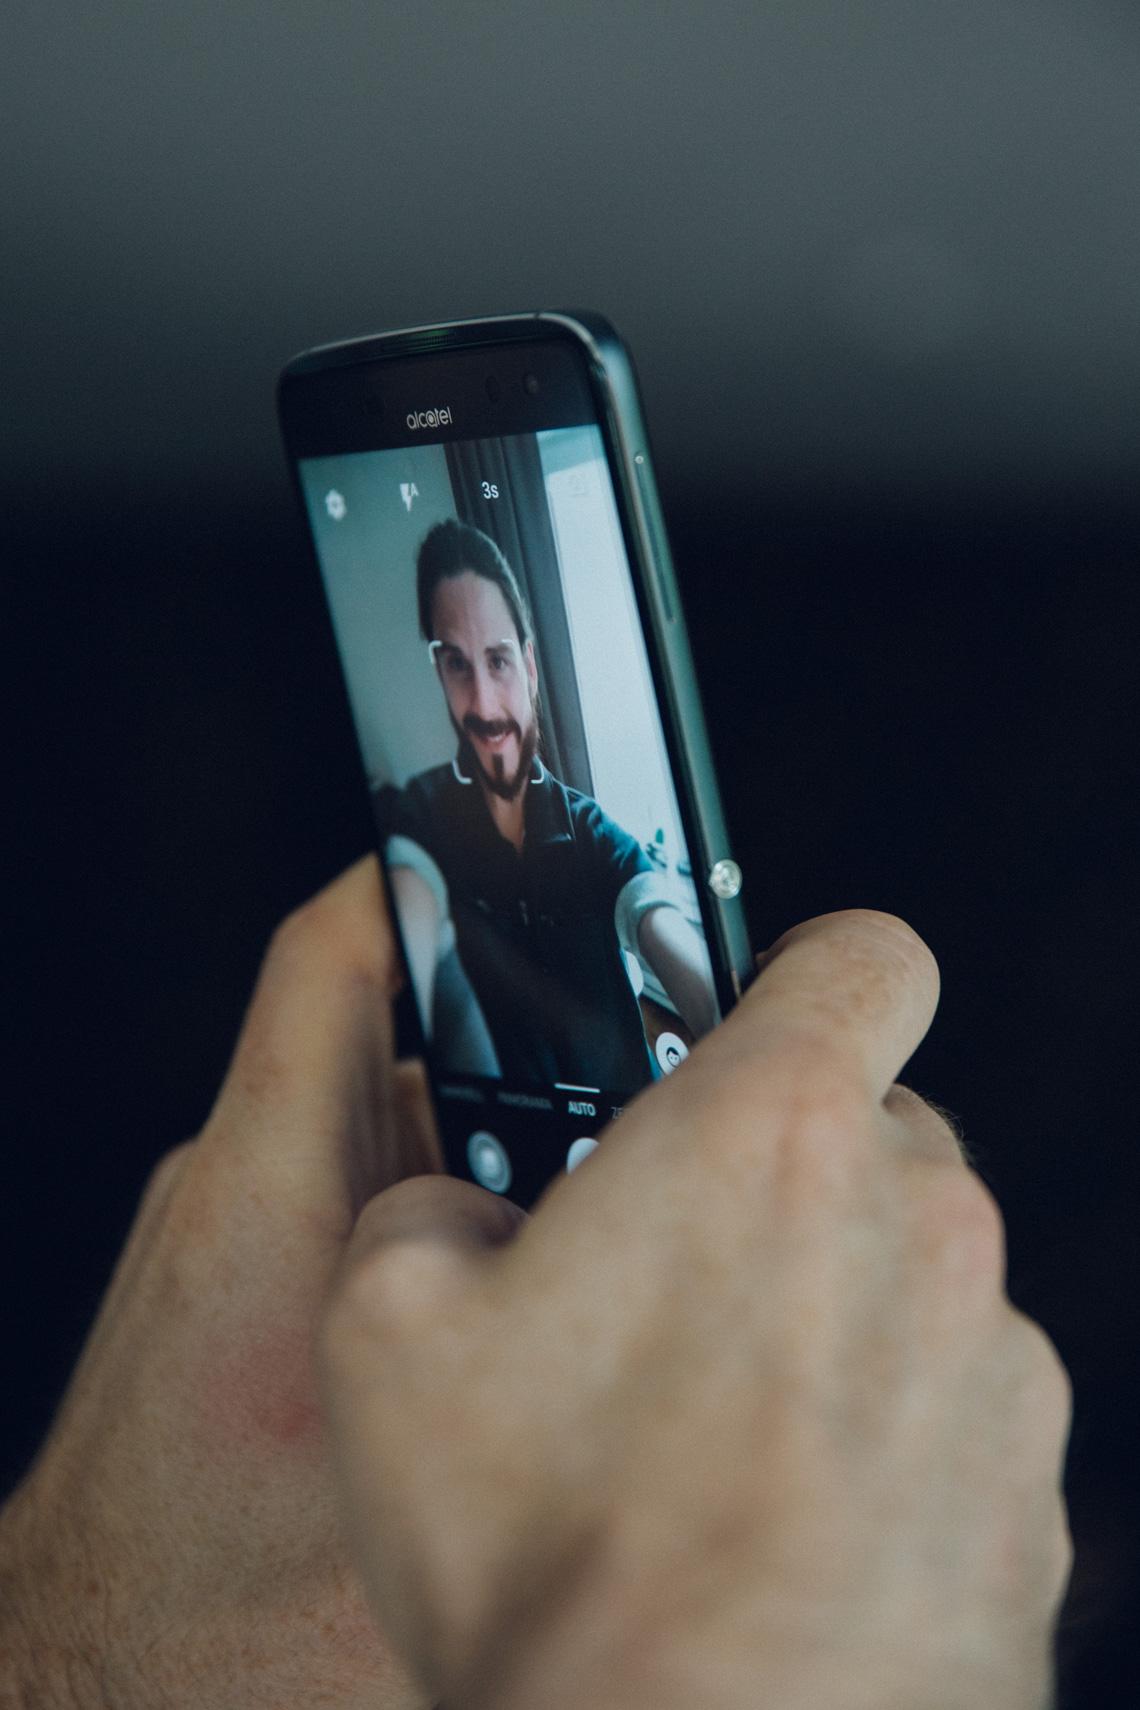 Kaisers-neue-Kleider-Fashion-Blog-Maenner-Lifestyle-Smartphone-Alcatel-Idol-Virtual-Reality-Kooperation